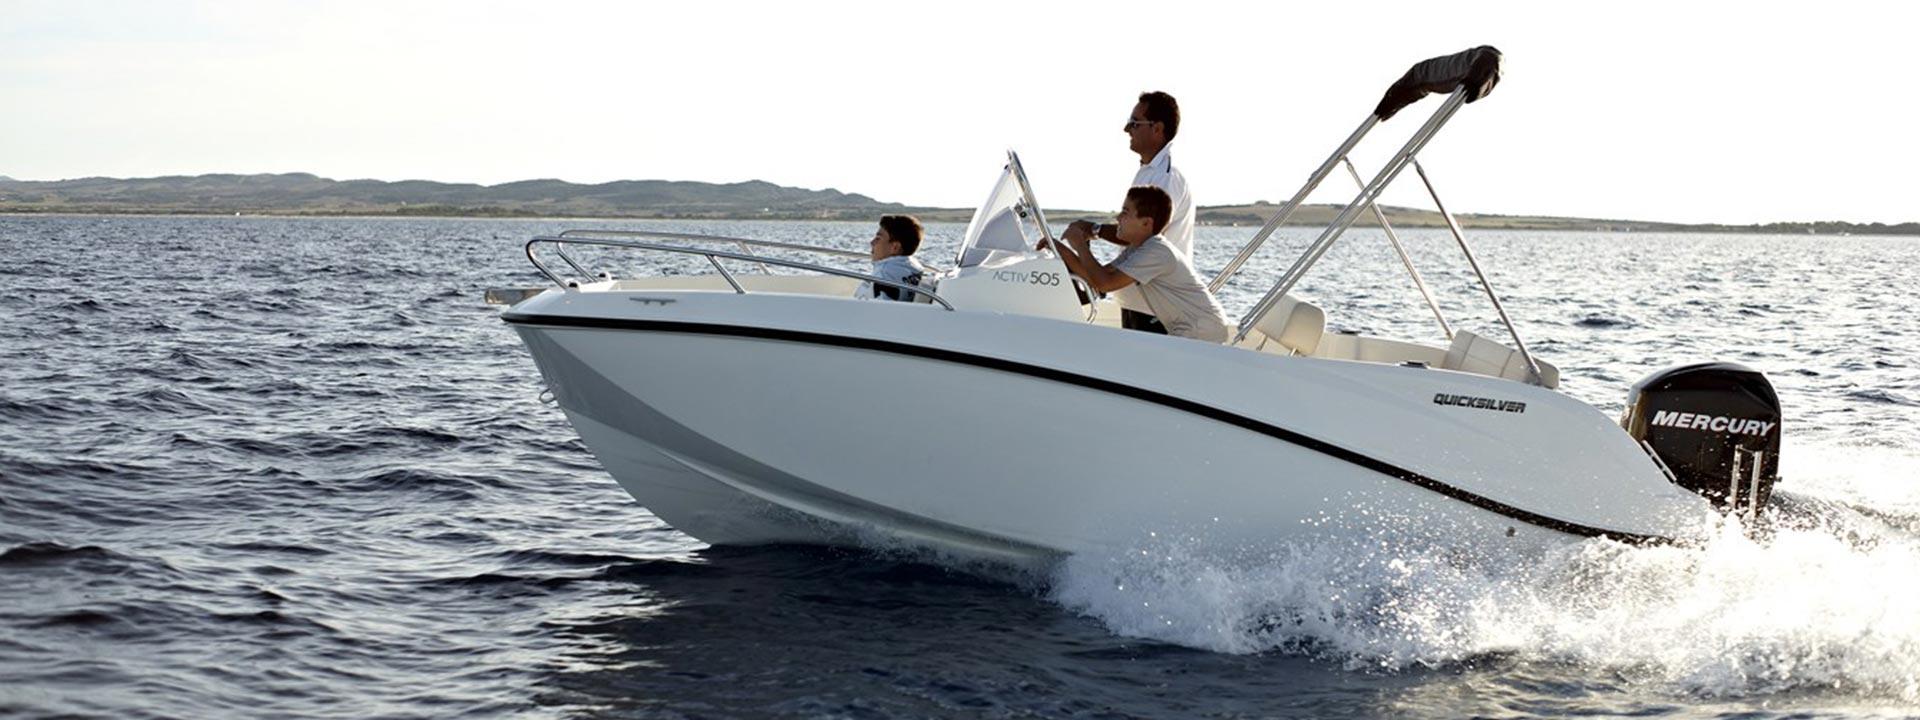 mayer-charter-boat-header-quicksilver-activ-505-open-05